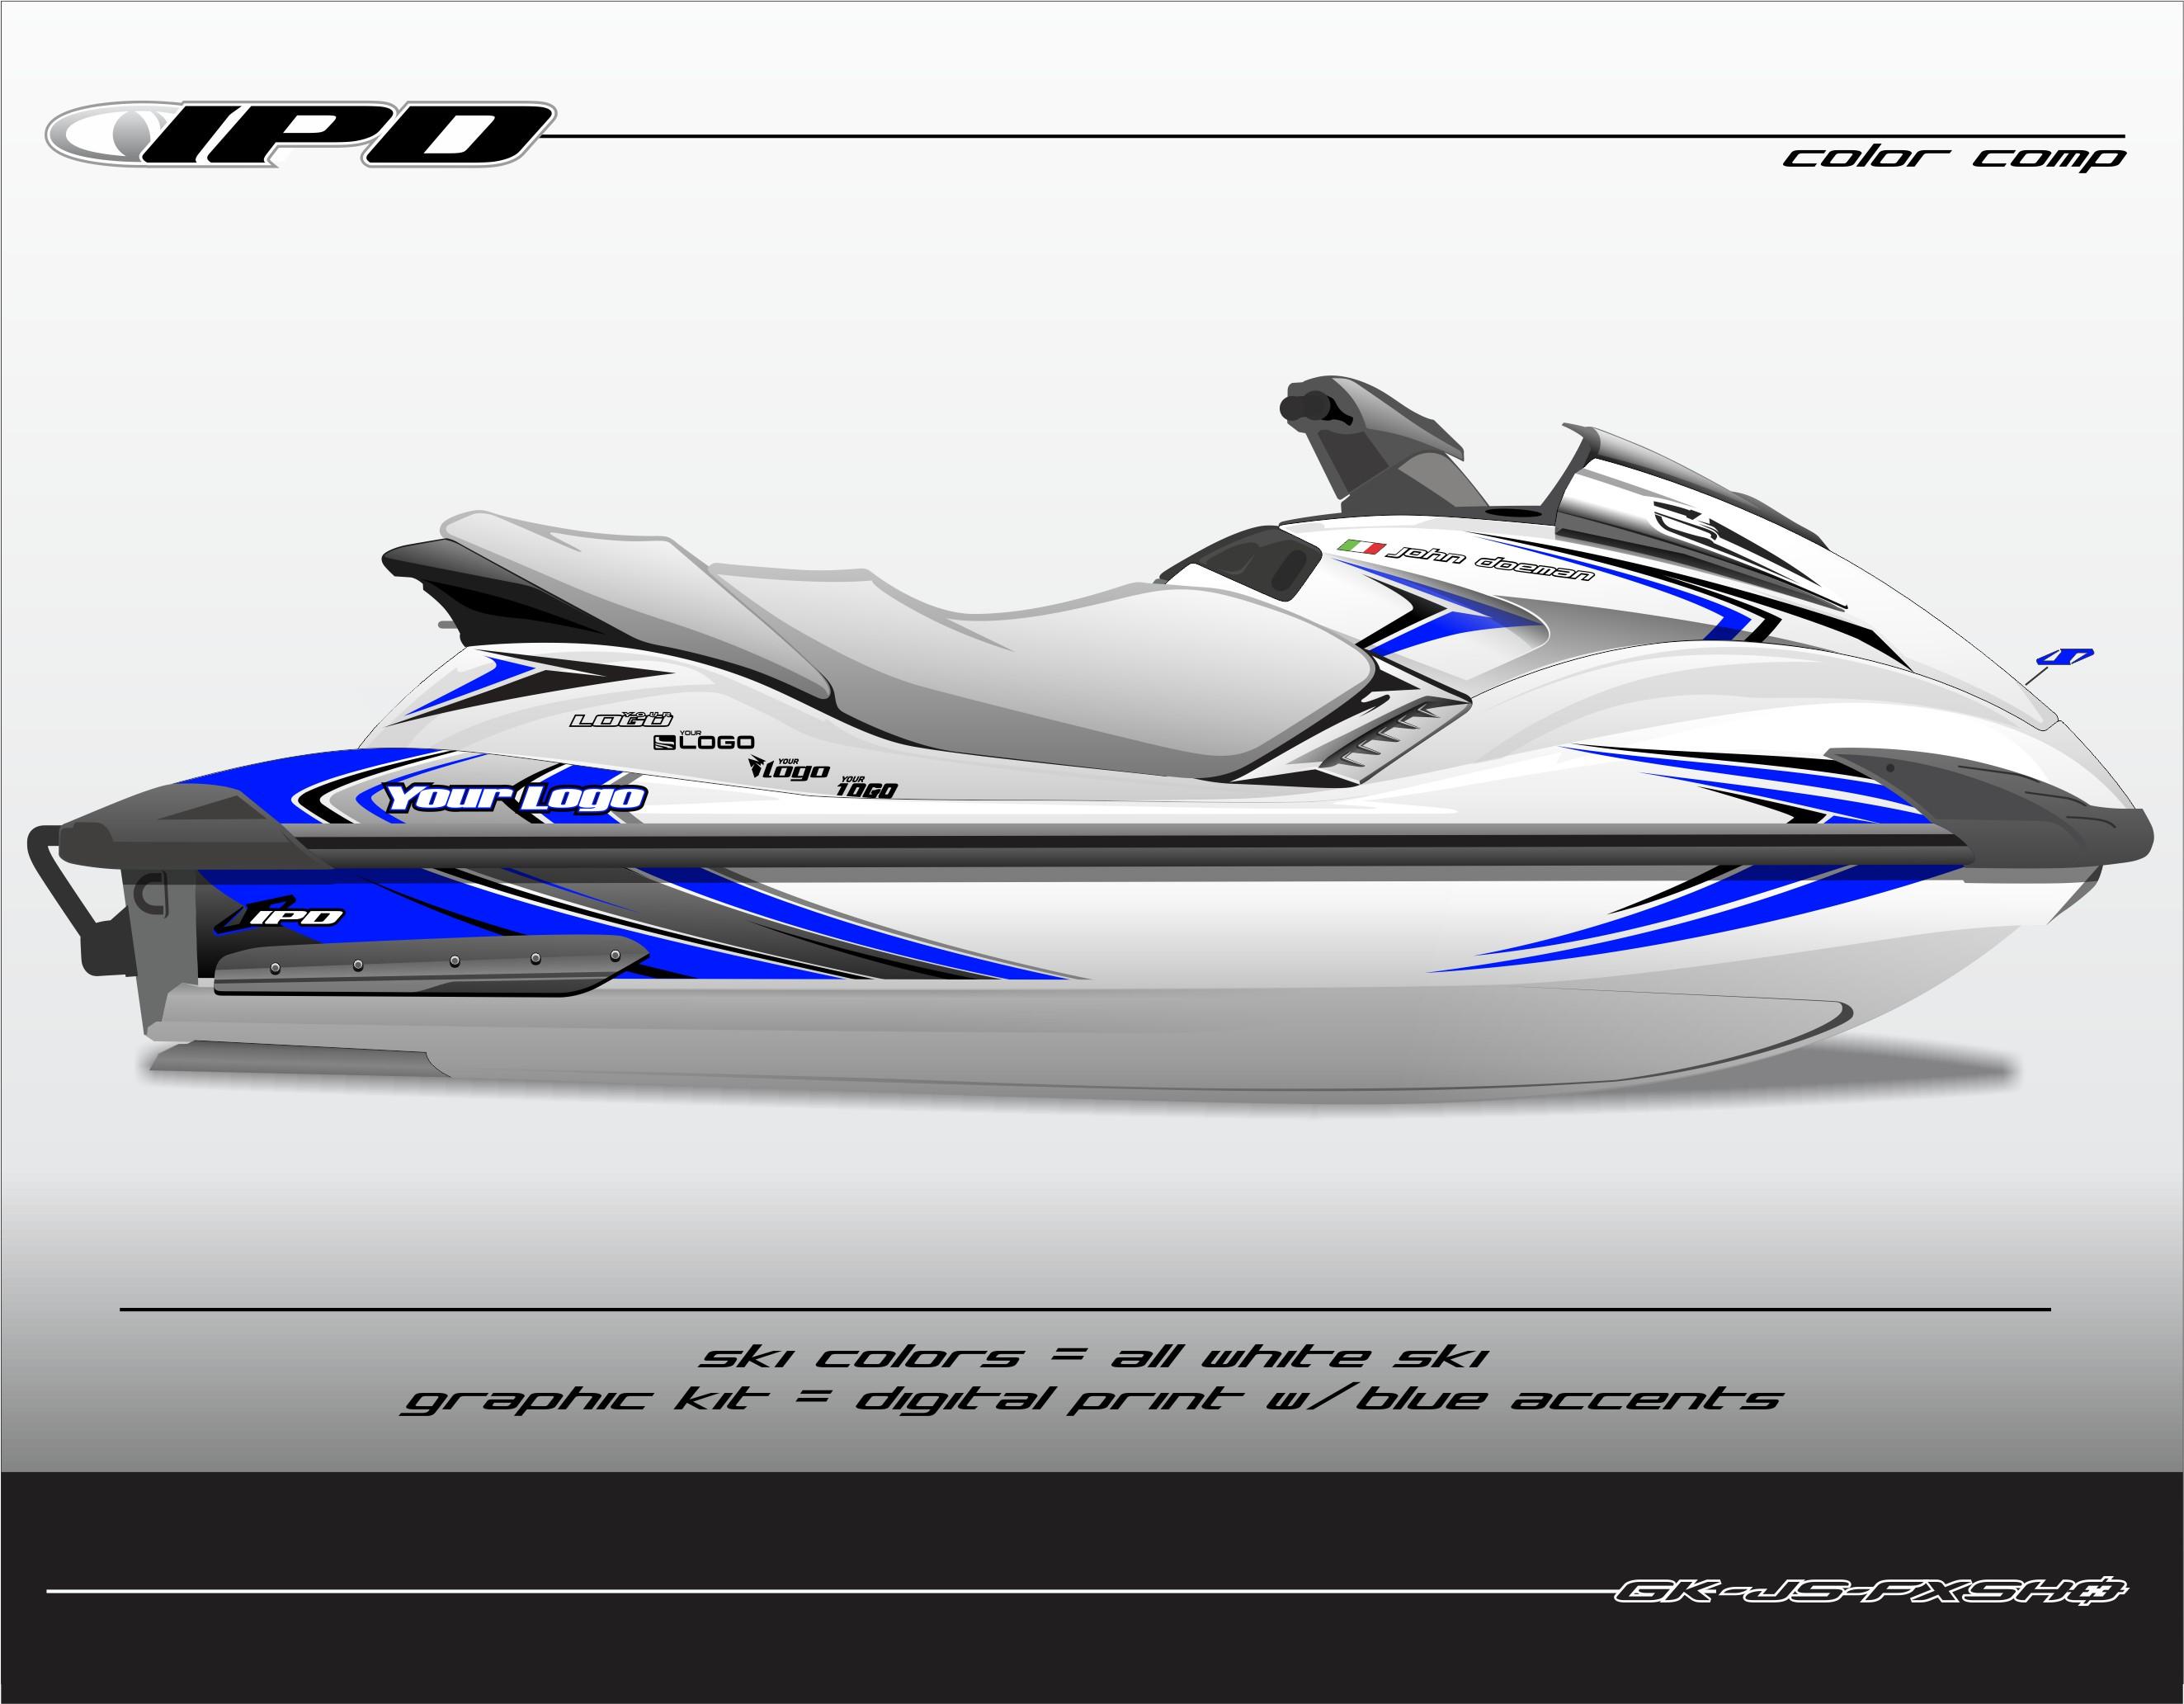 kawasaki 1100 jet ski engine diagram remanufactured jet